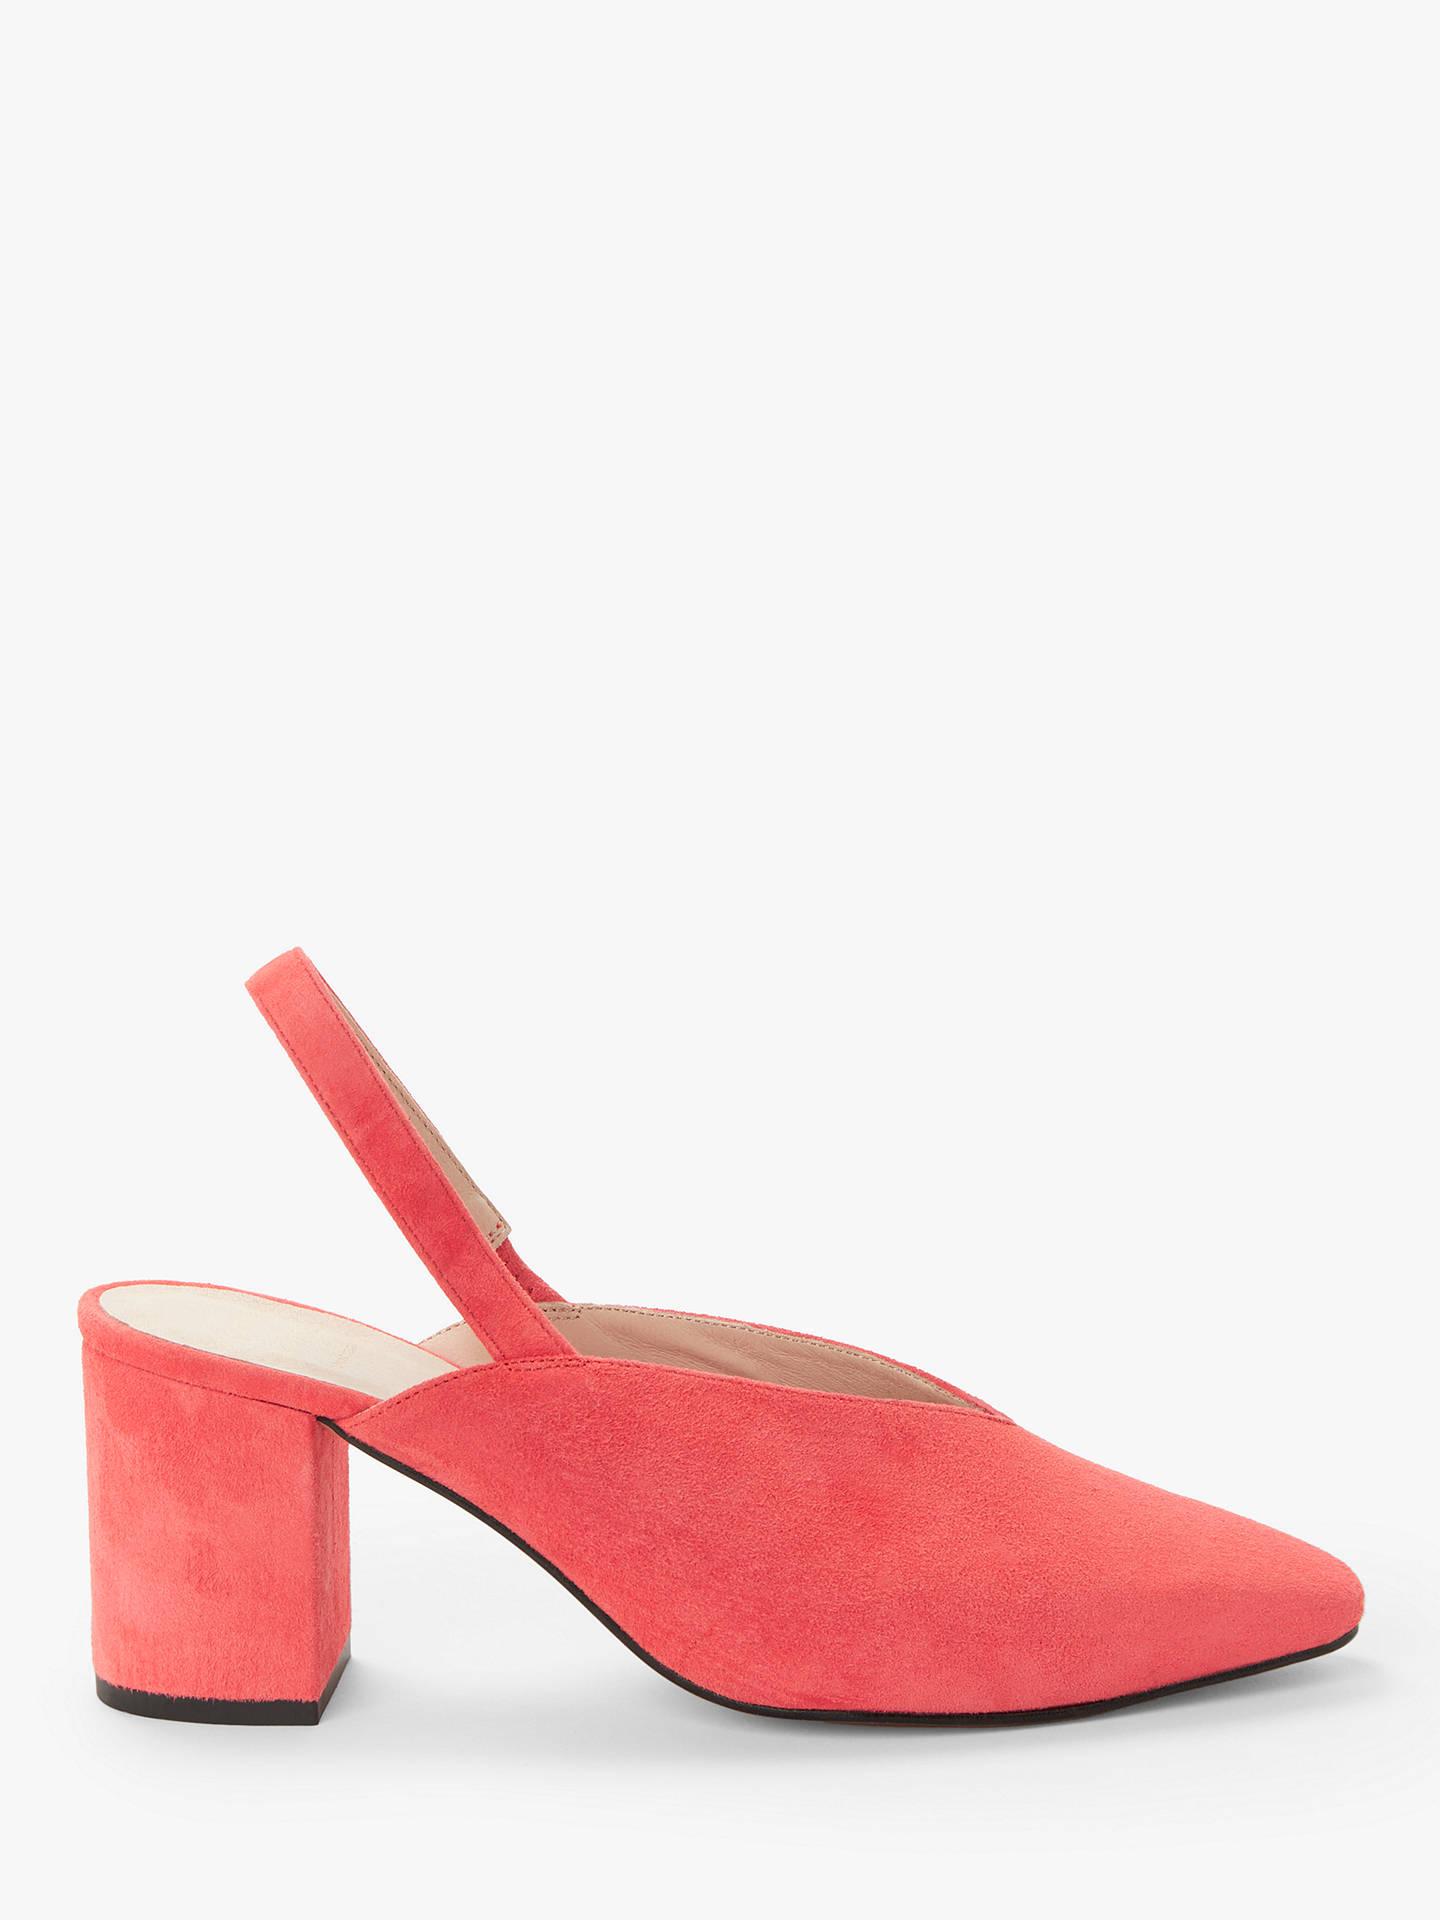 35393d31d96 John Lewis & Partners Jody Block Heel V Cut Slingback Court Shoes, Red Suede